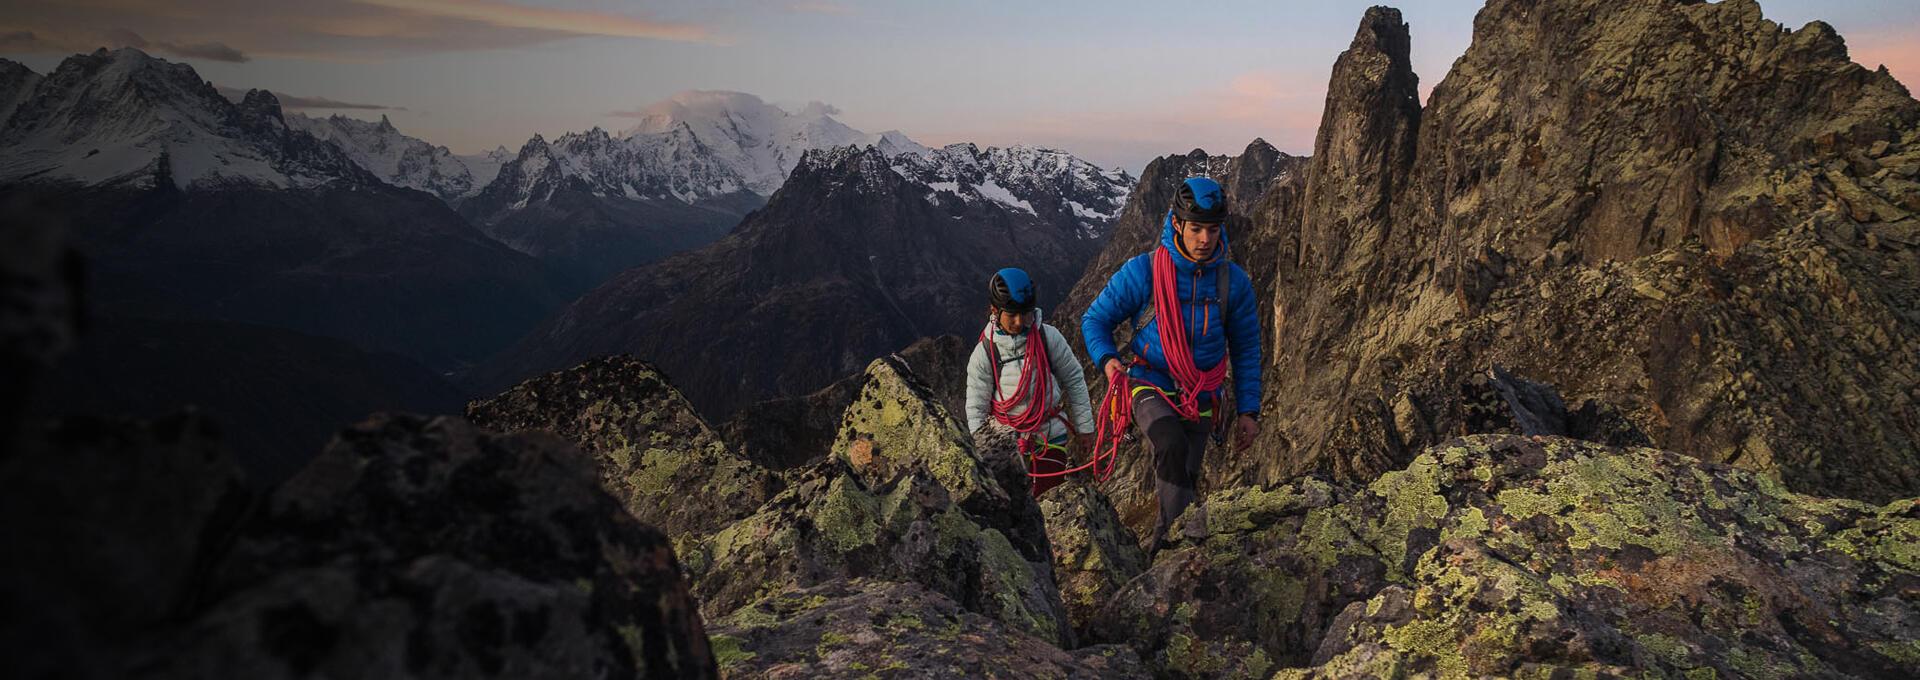 Vêtements Alpinisme